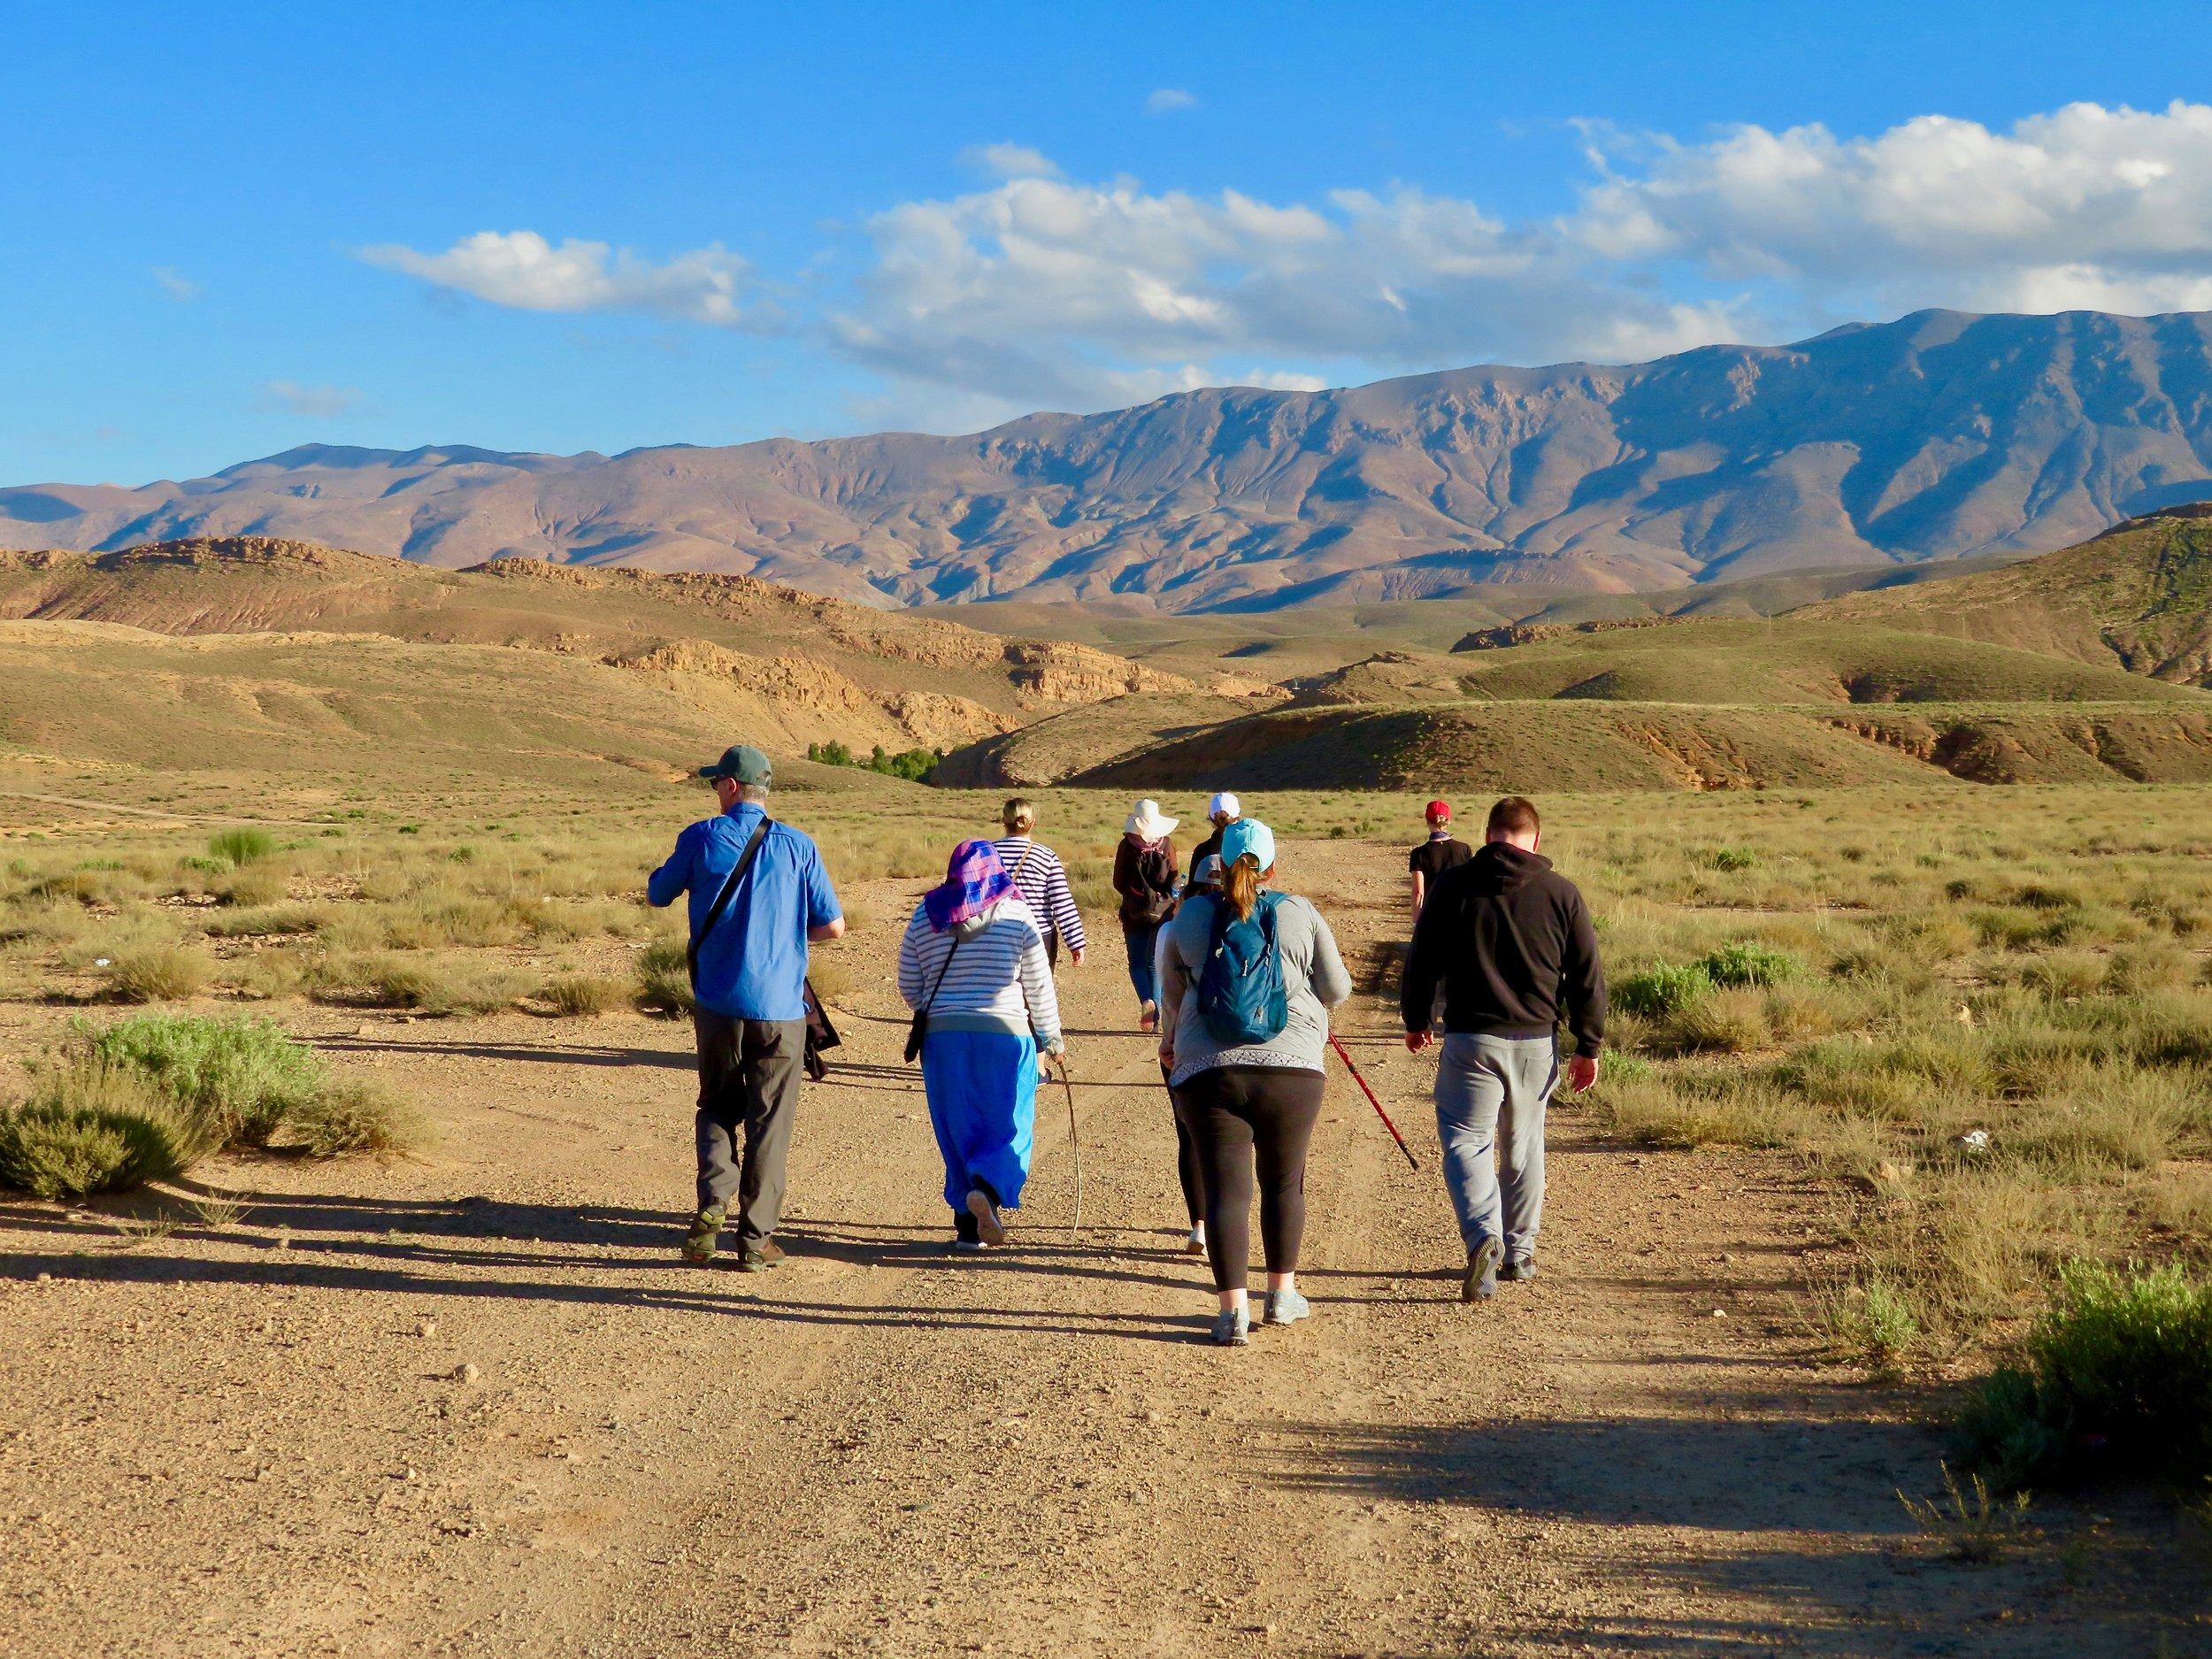 Heading out, Atlas Mountains